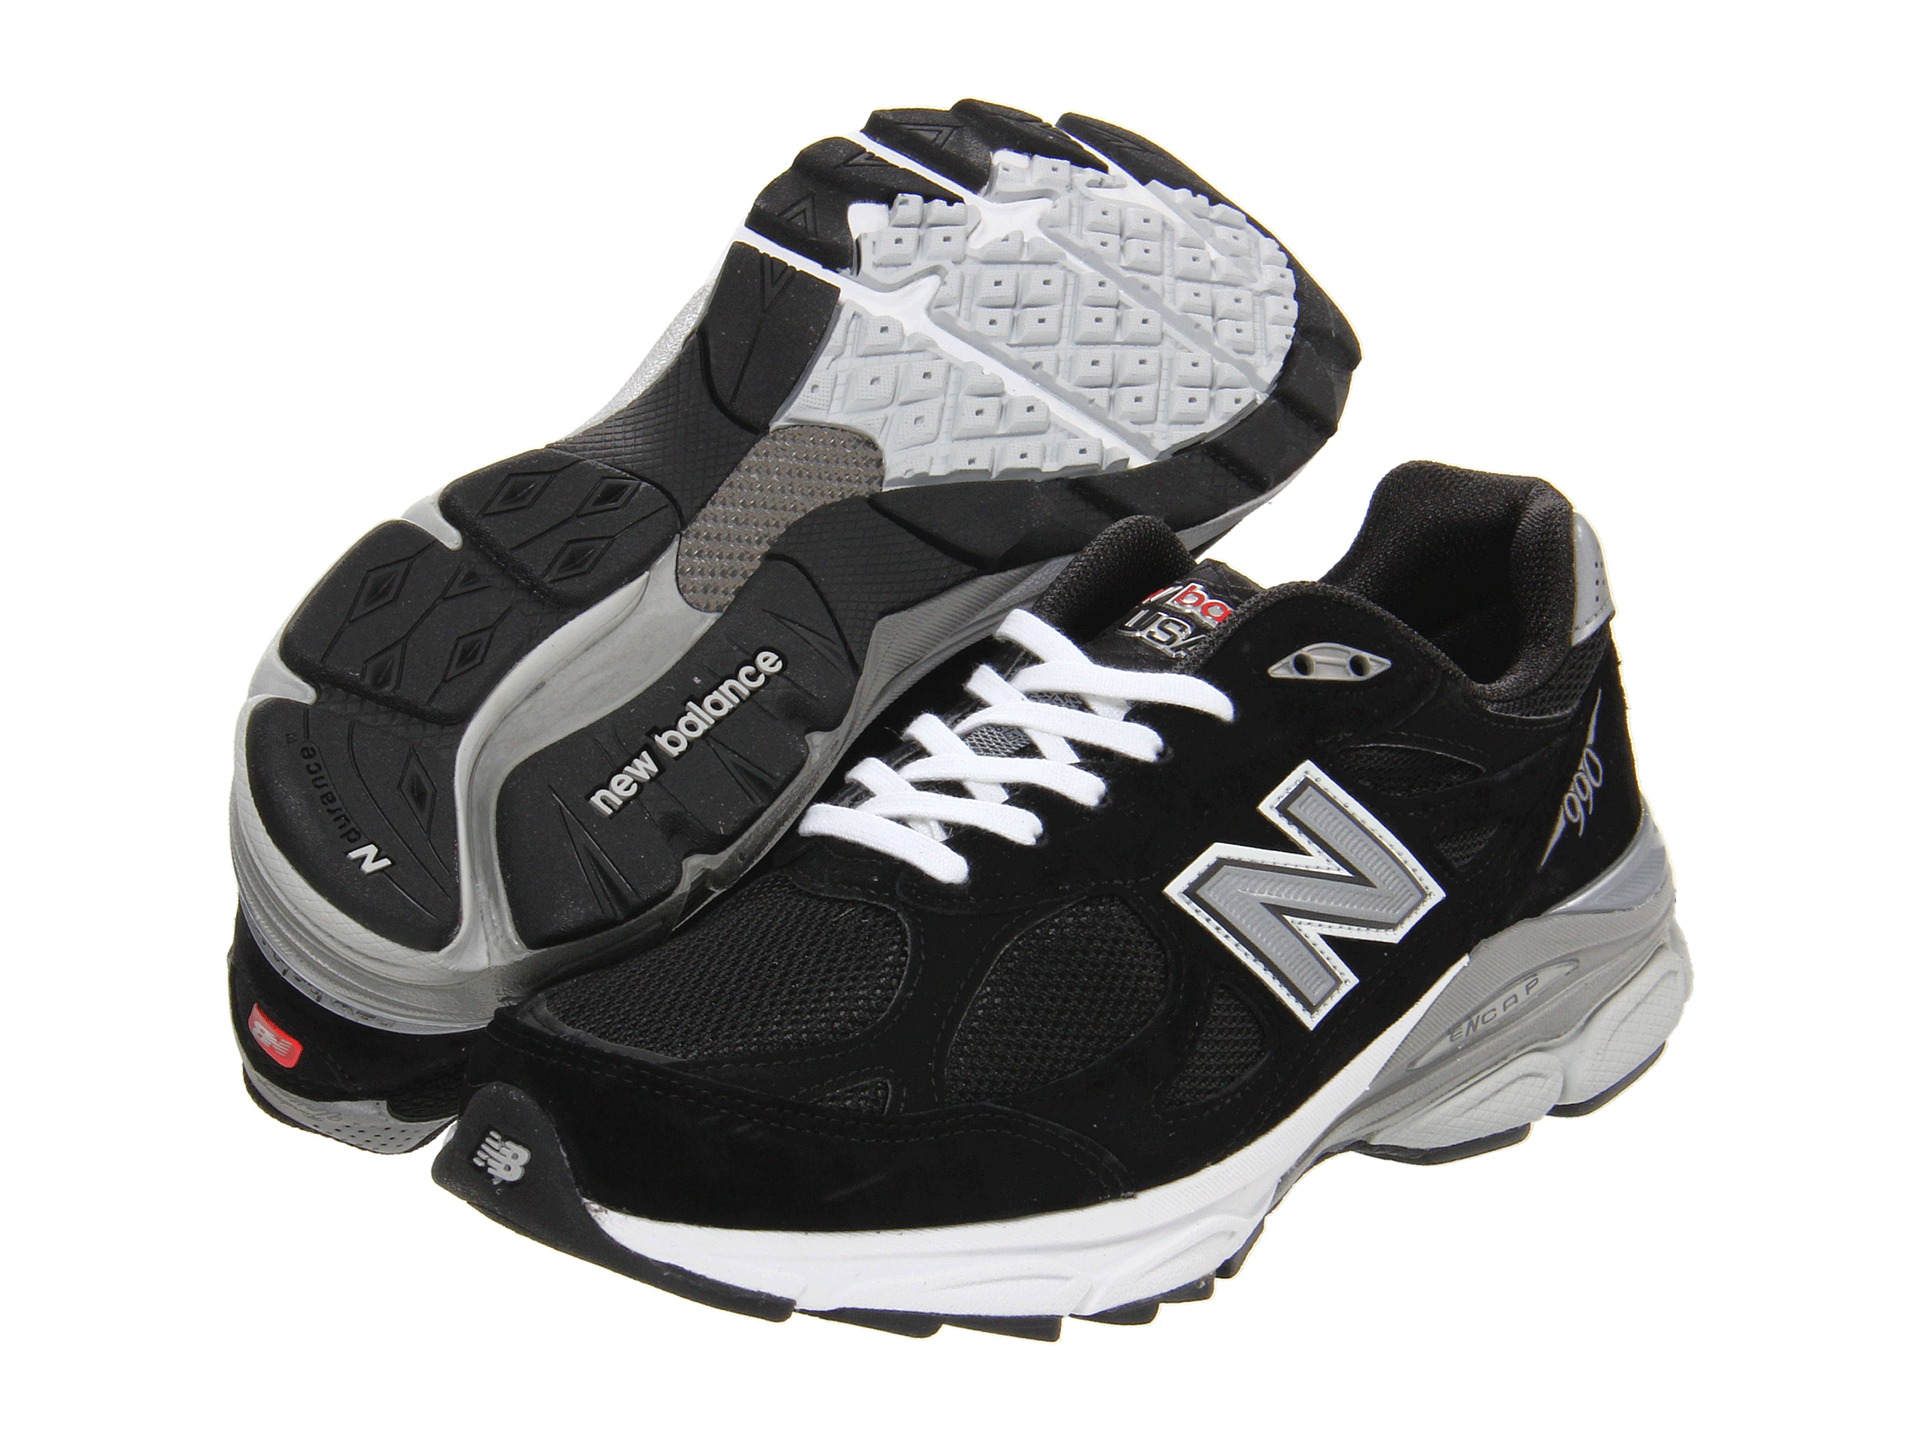 993 black new balance